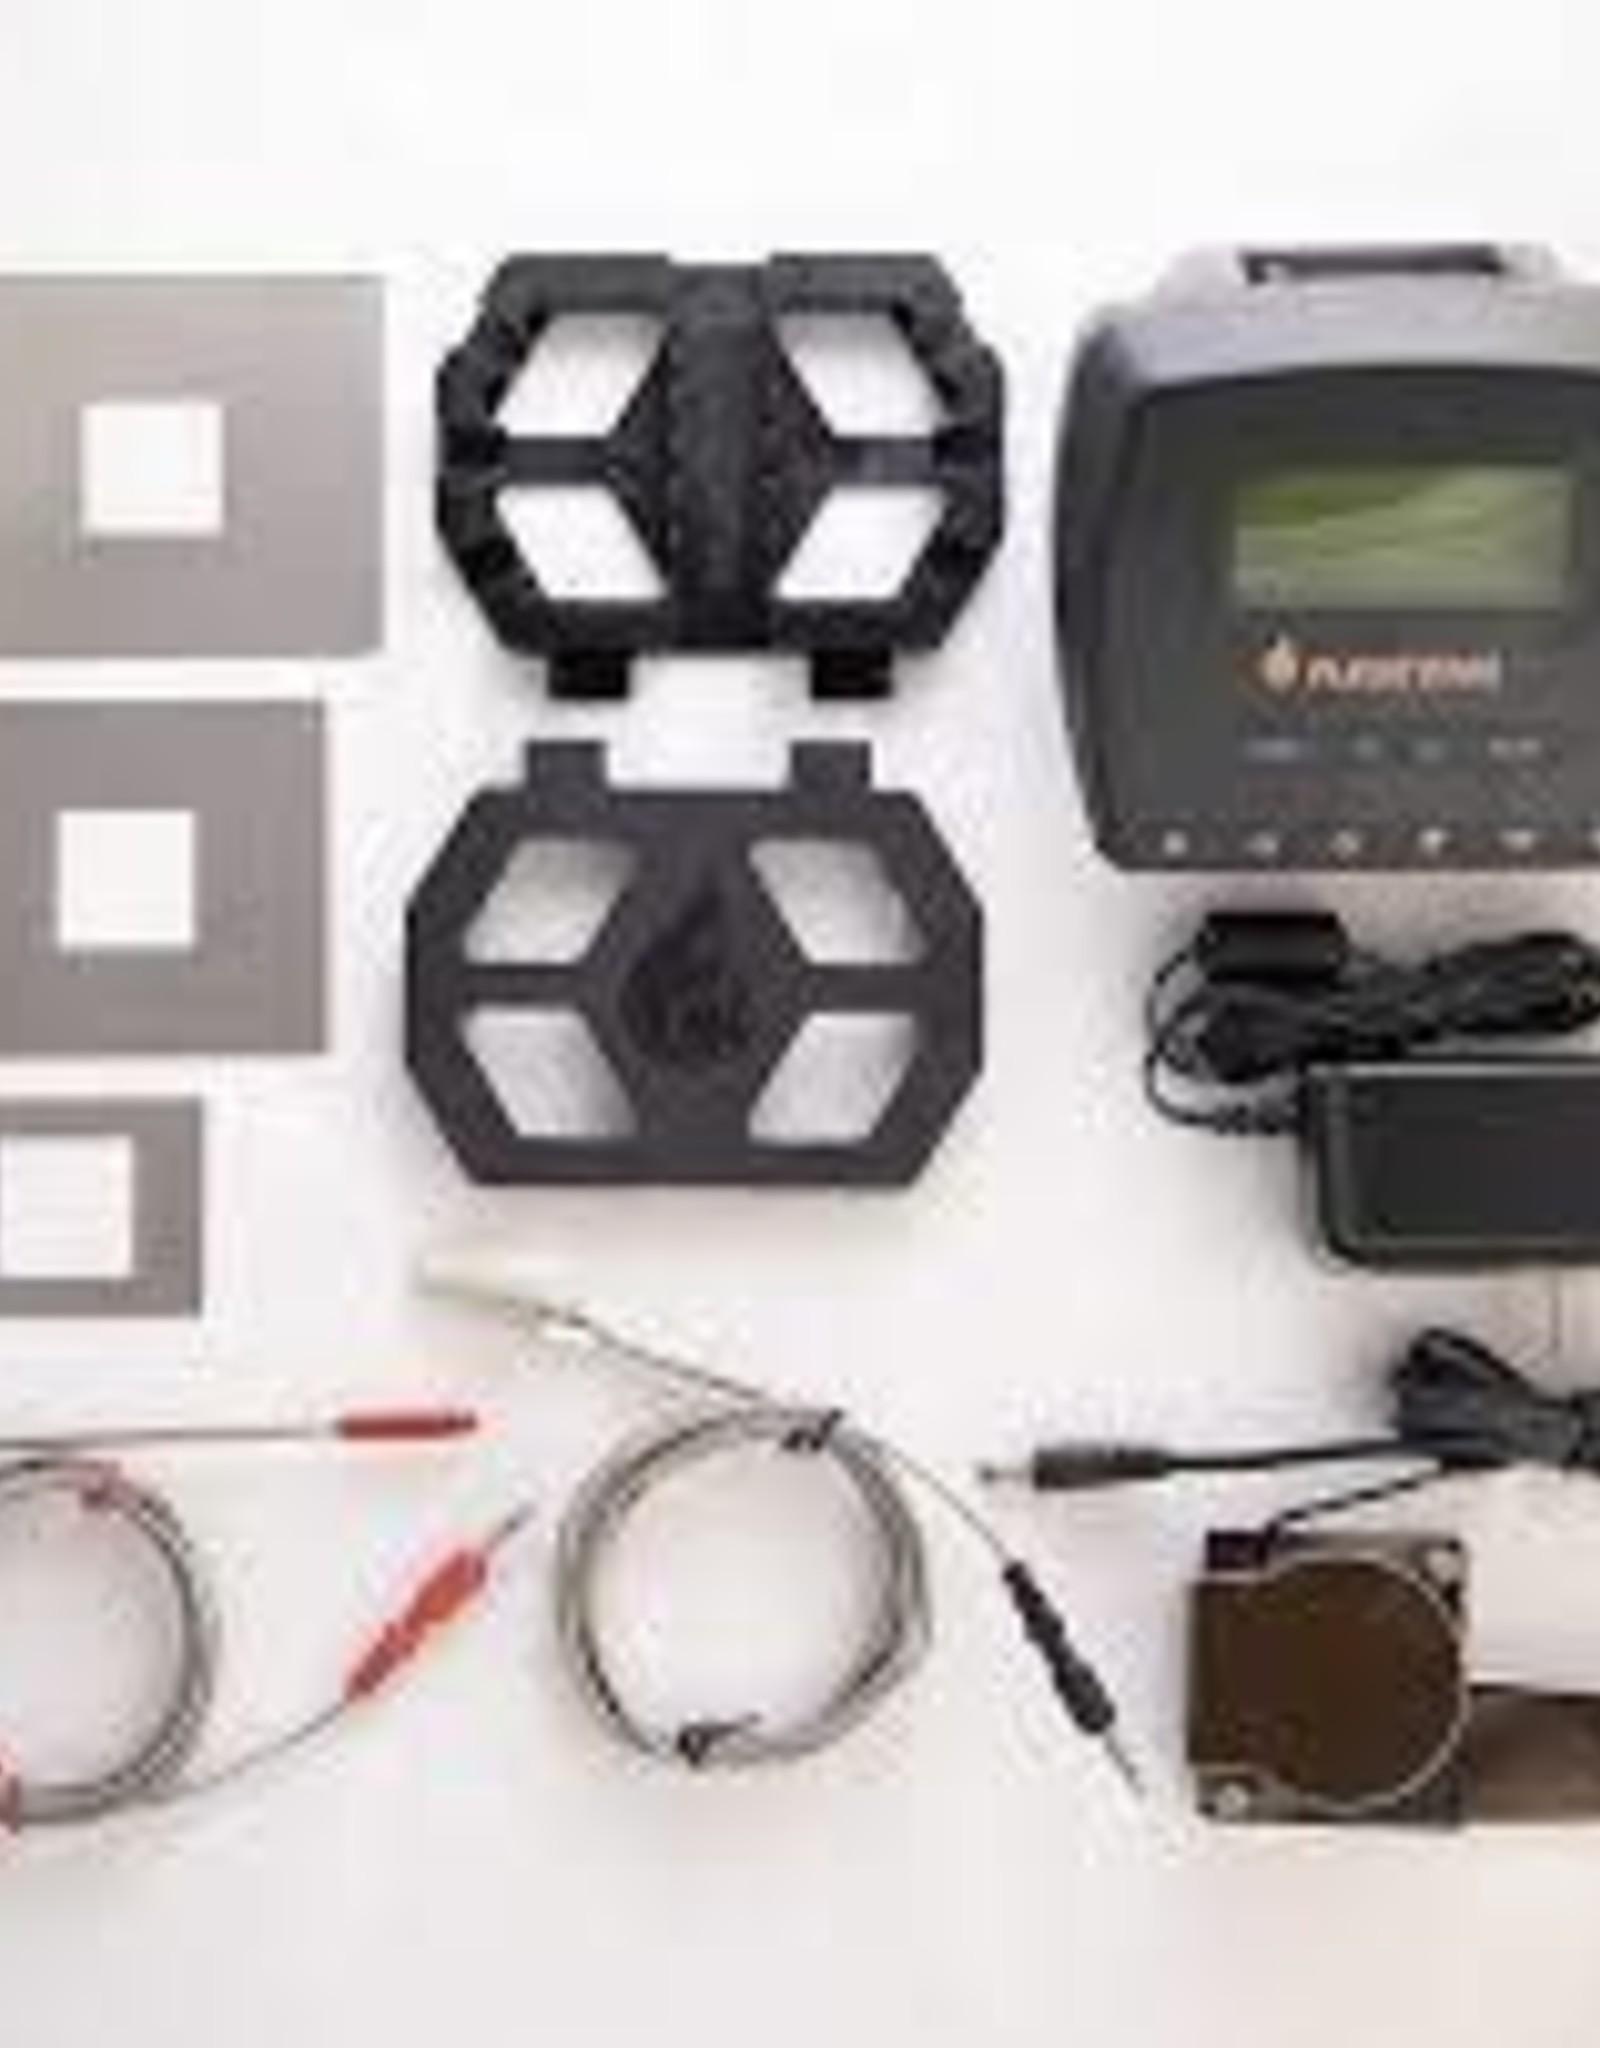 Flame Boss Flame Boss - 500-K WiFi Smoker Controller Kit